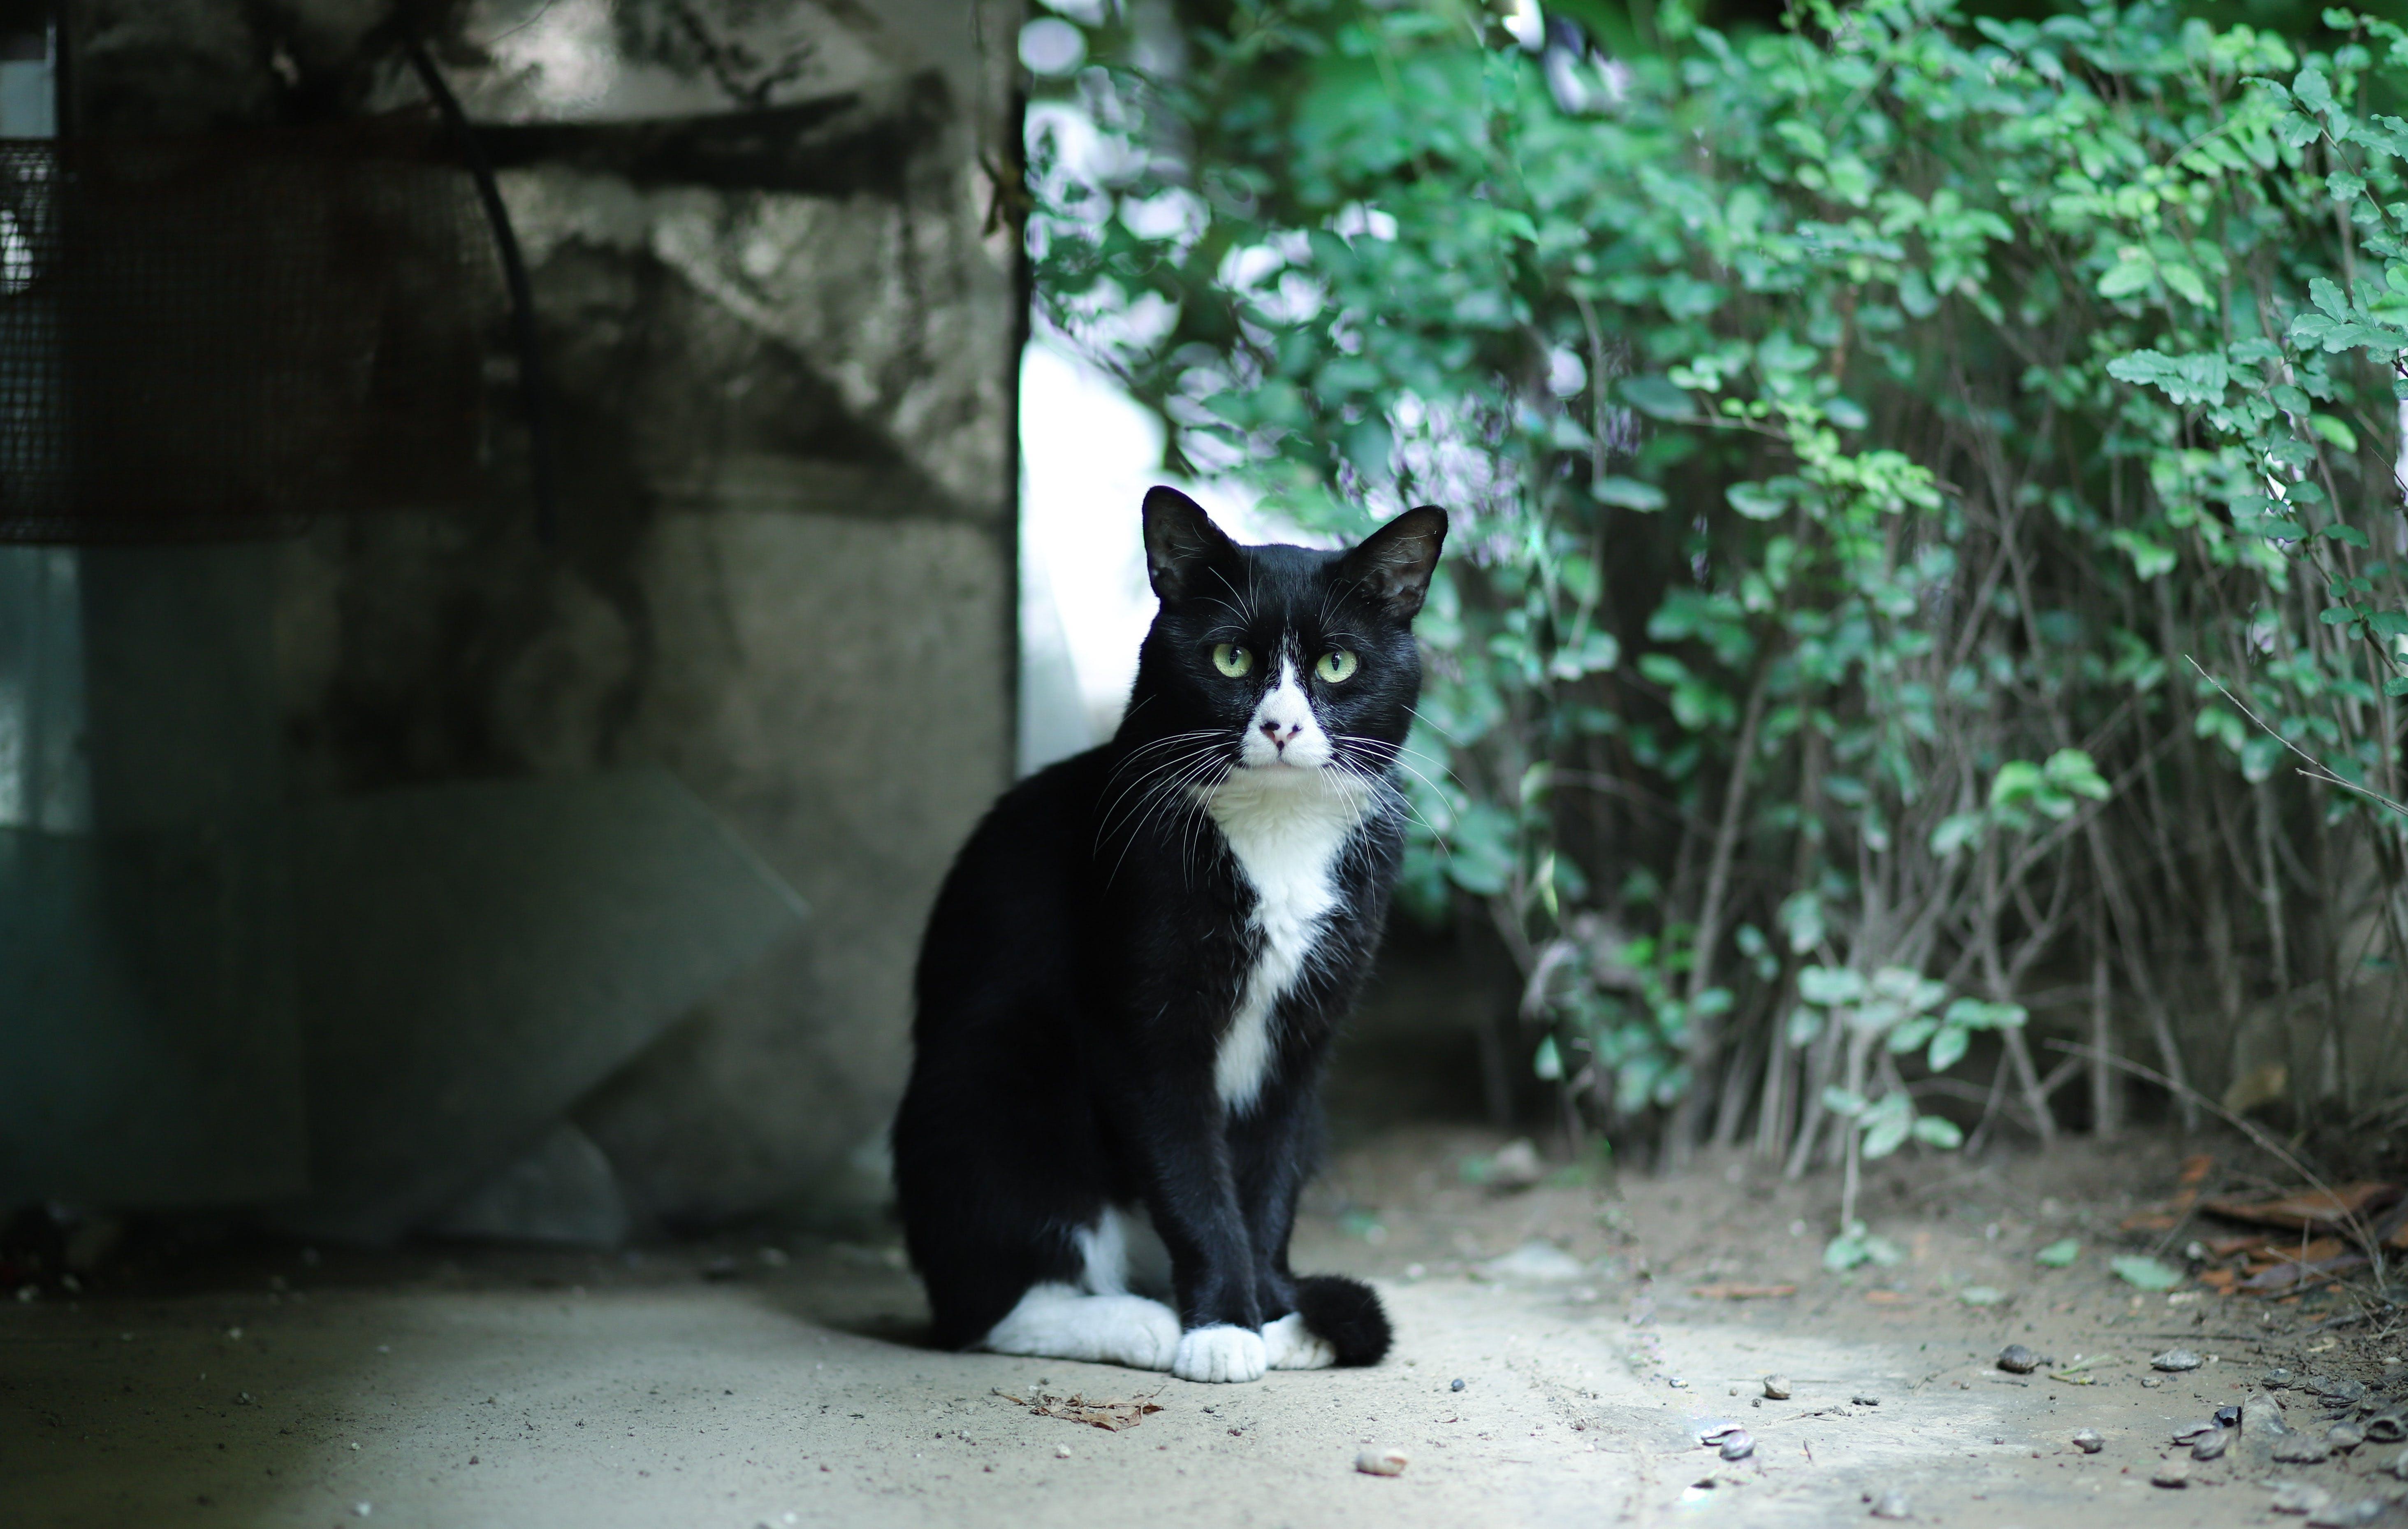 Cat Near Plants